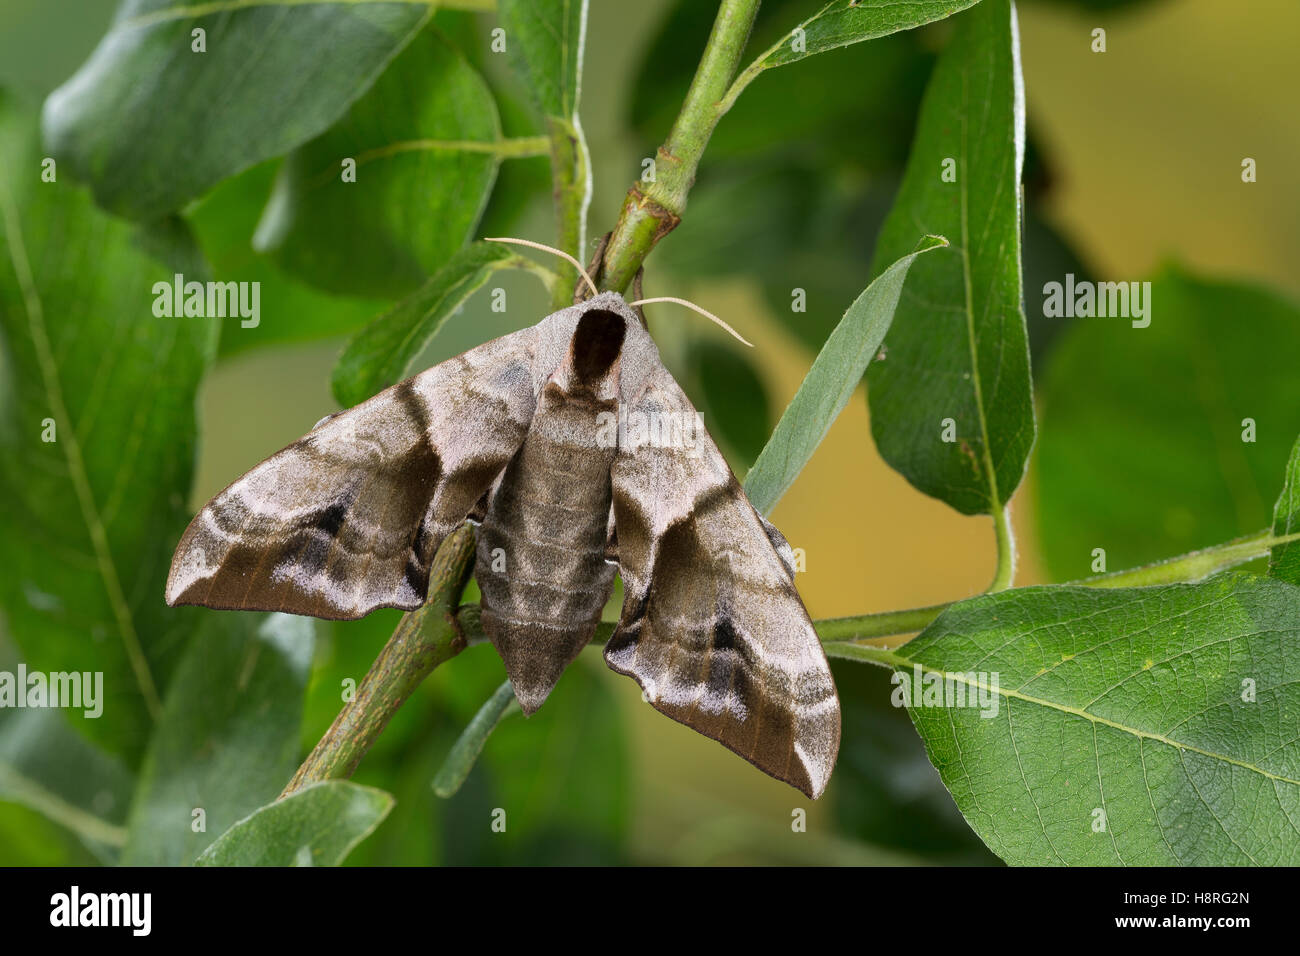 Abendpfauenauge, Abend-Pfauenauge, Smerinthus ocellata, Smerinthus ocellatus, Eyed Hawk-Moth, Eyed Hawkmoth, Le - Stock Image